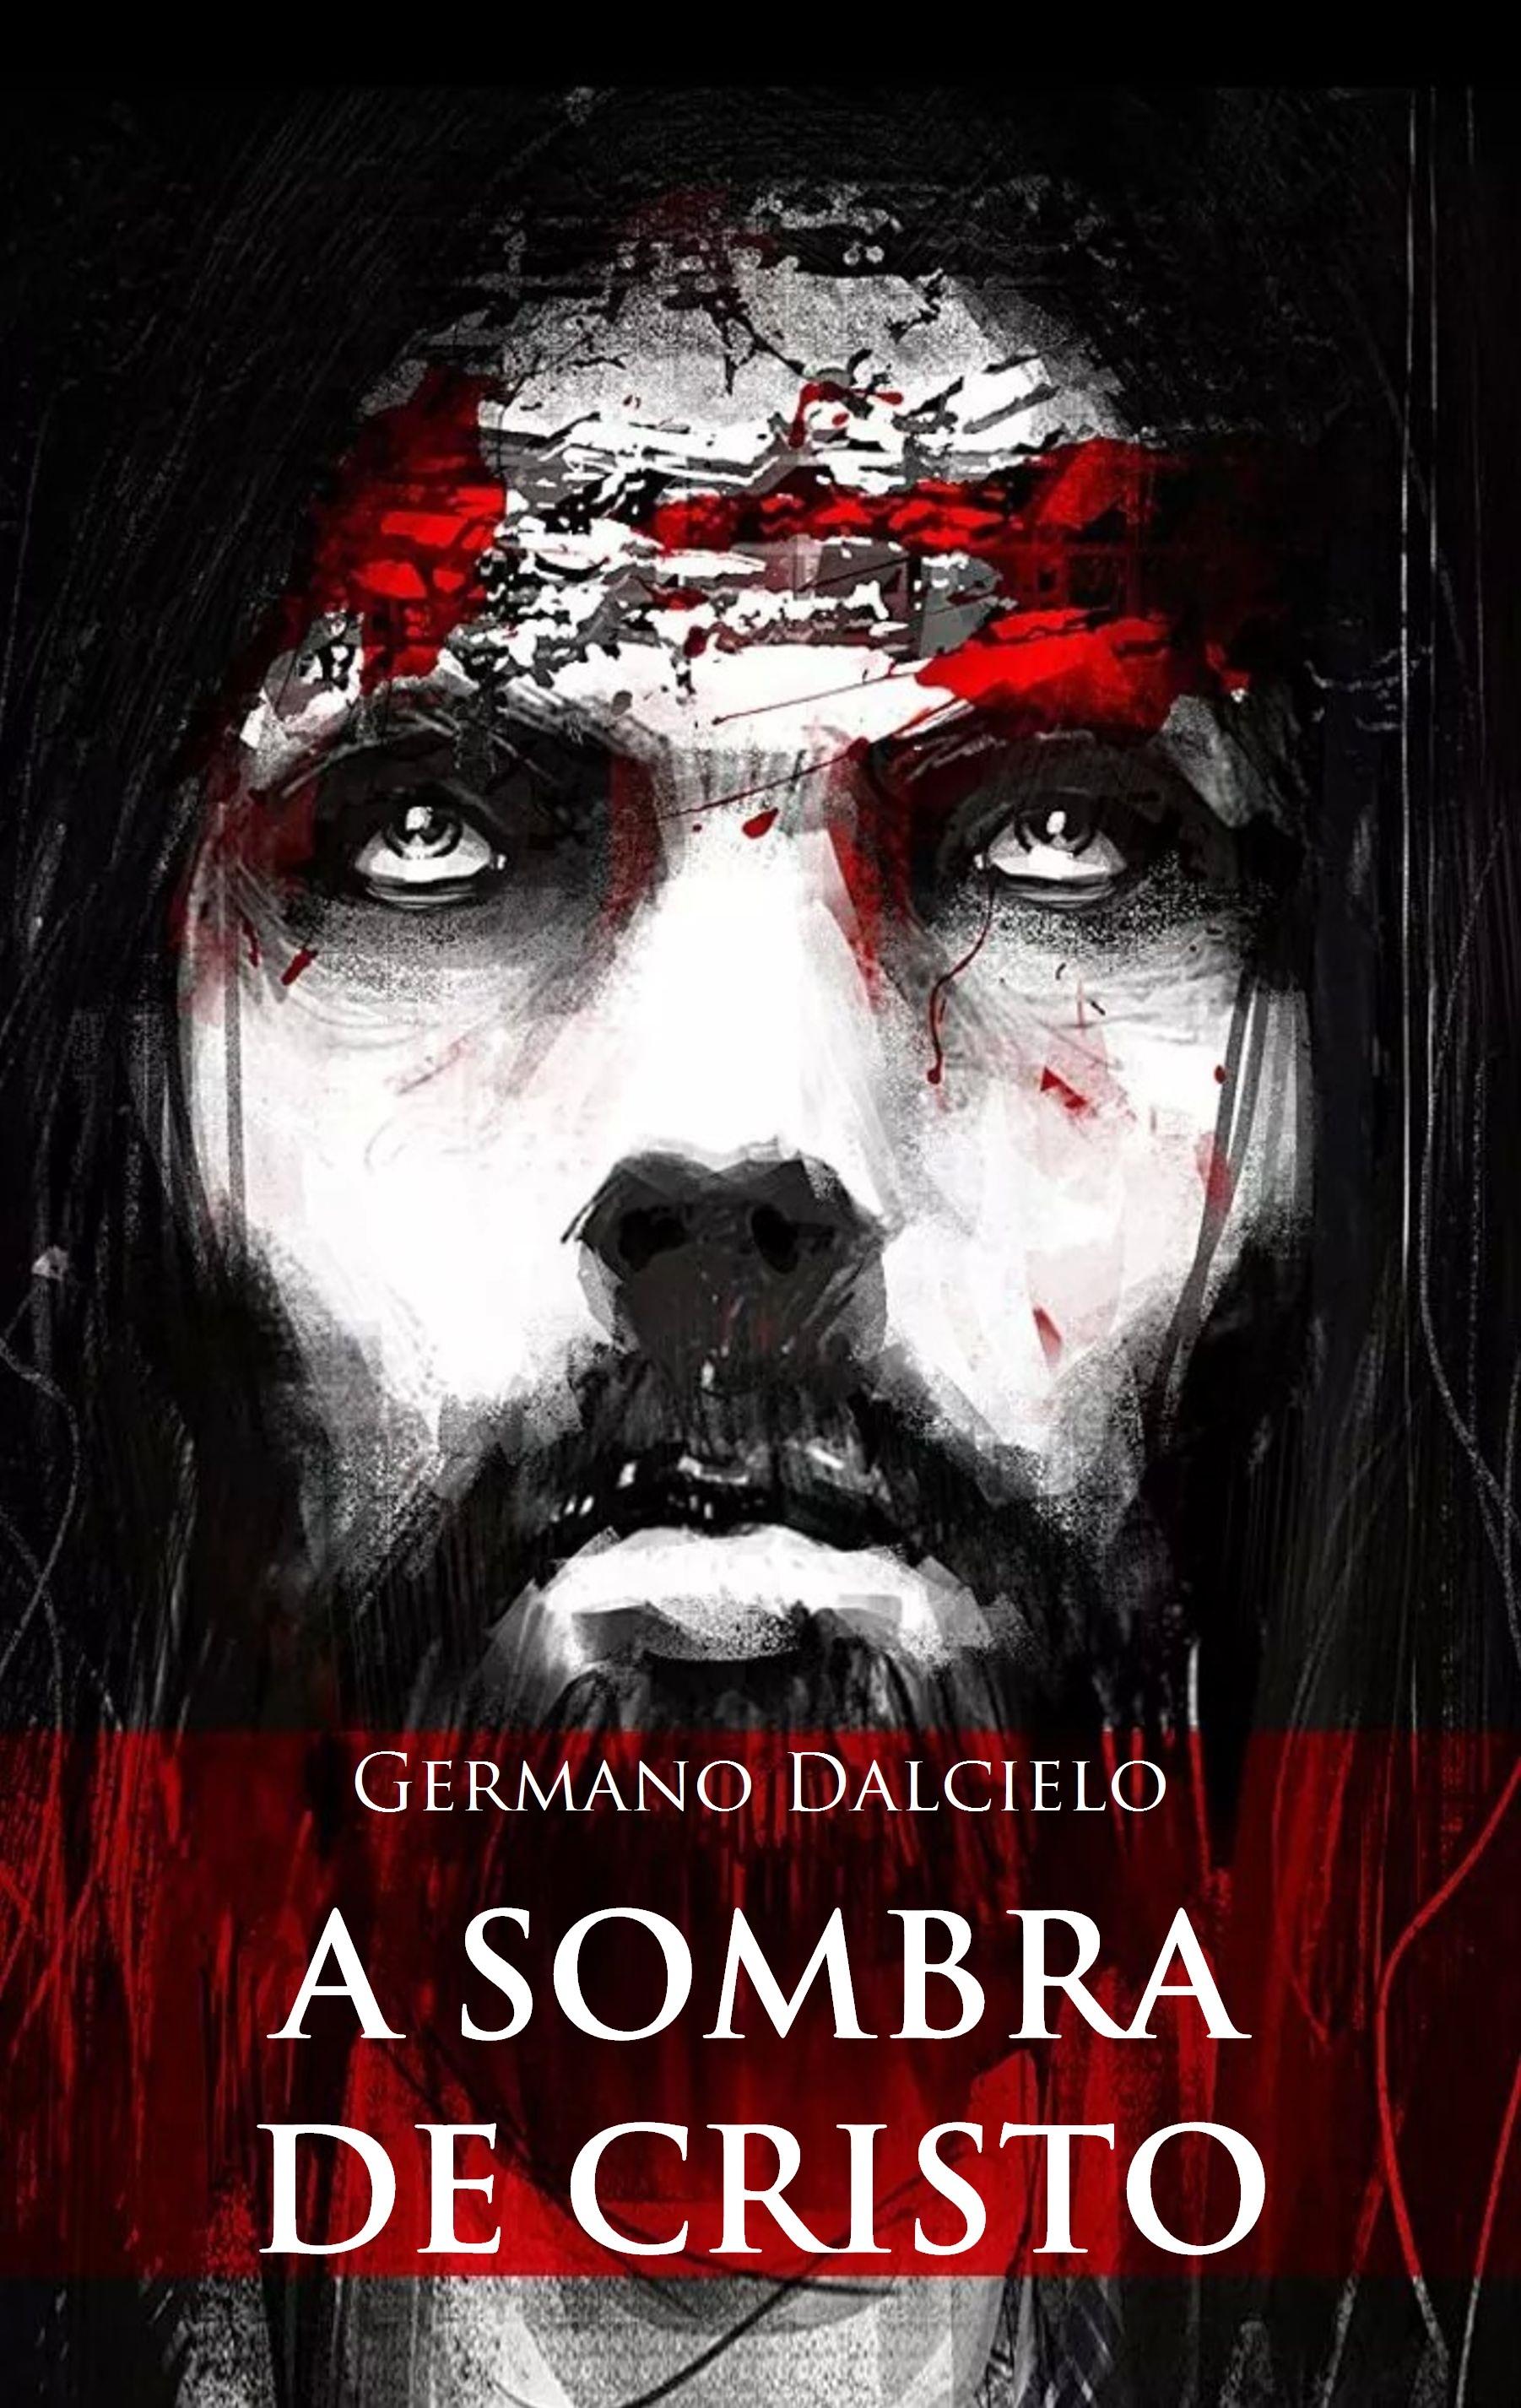 A sombra de Cristo Germano Dalcielo